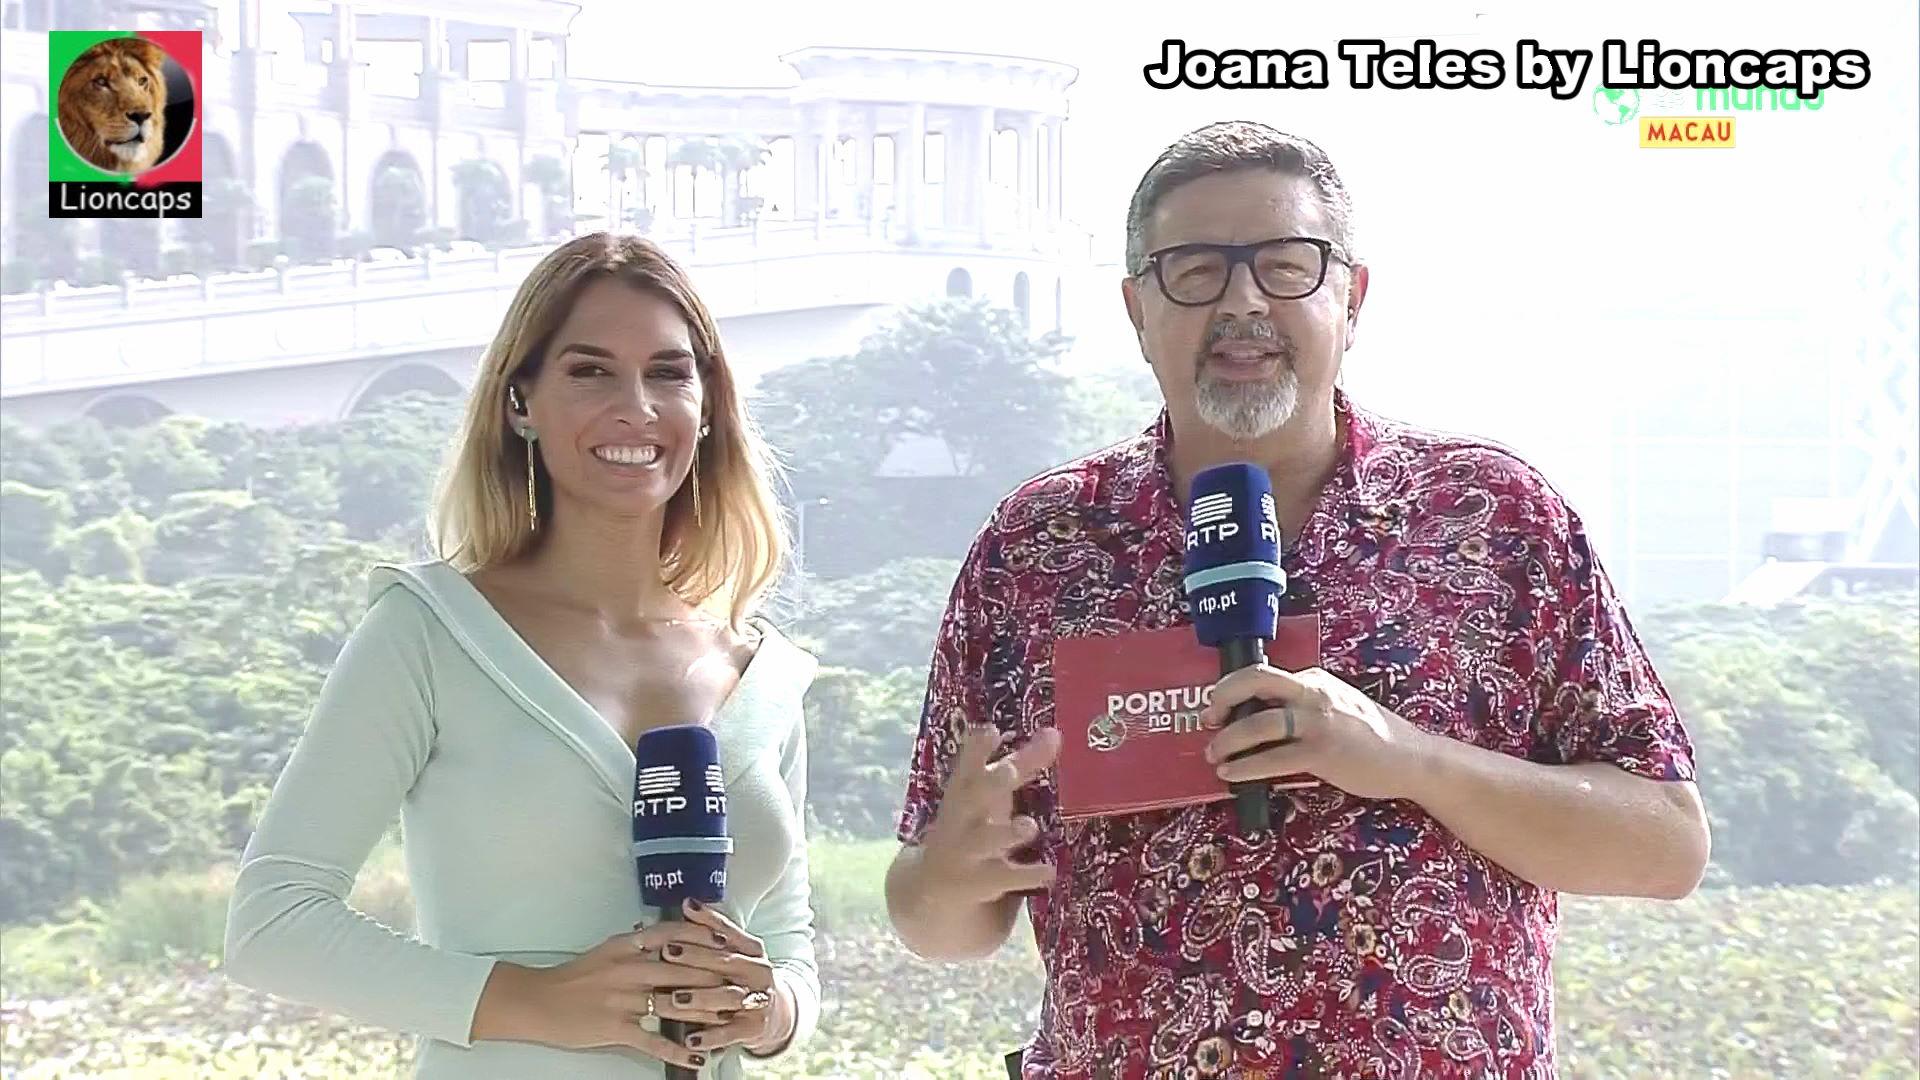 976695331_joana_teles_vs200125_11623_122_174lo.JPG